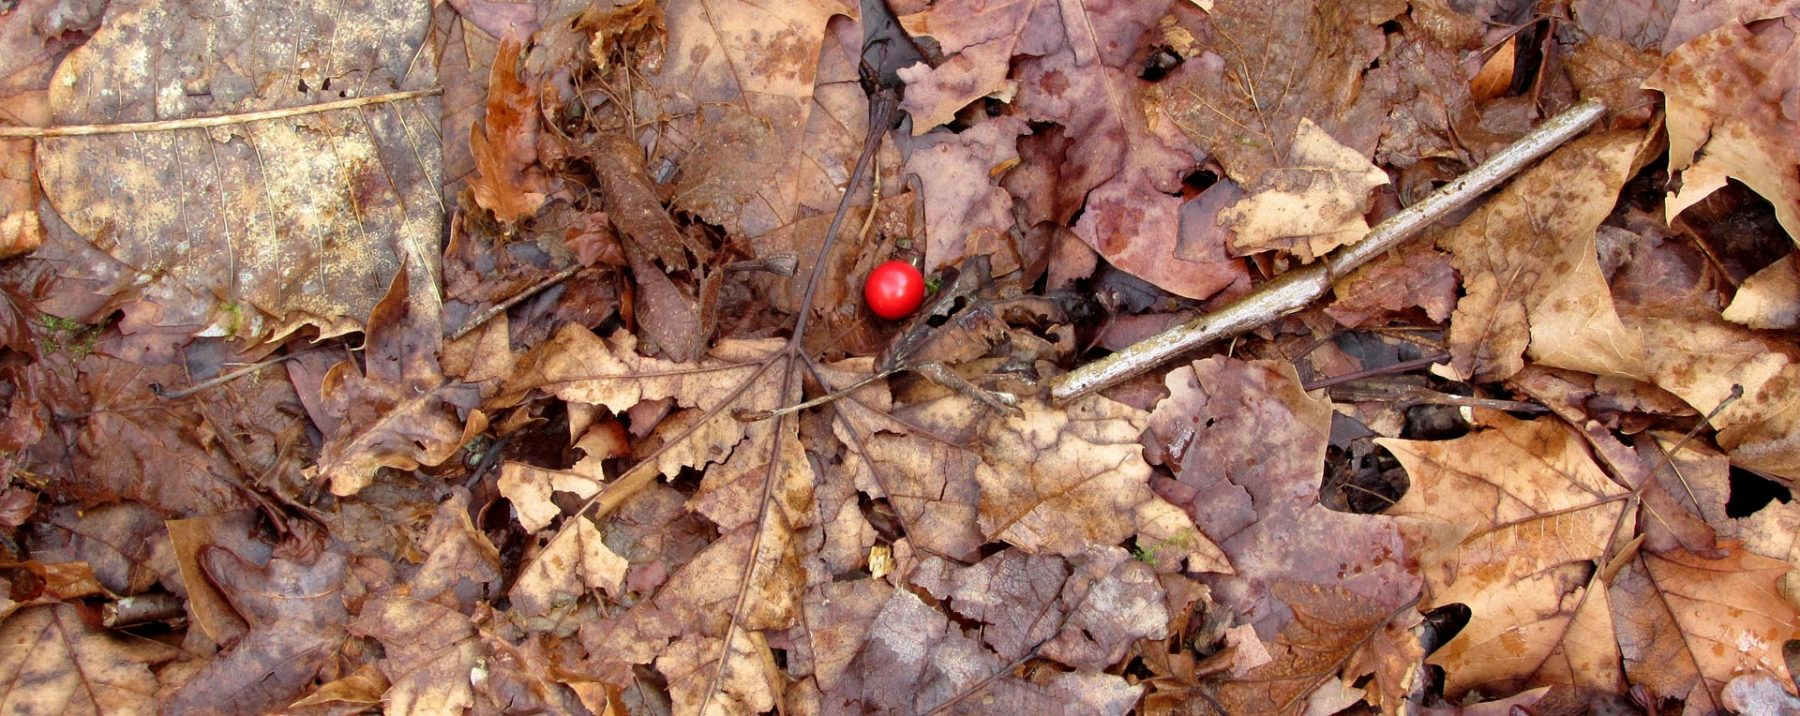 Hajas caidas en otoño